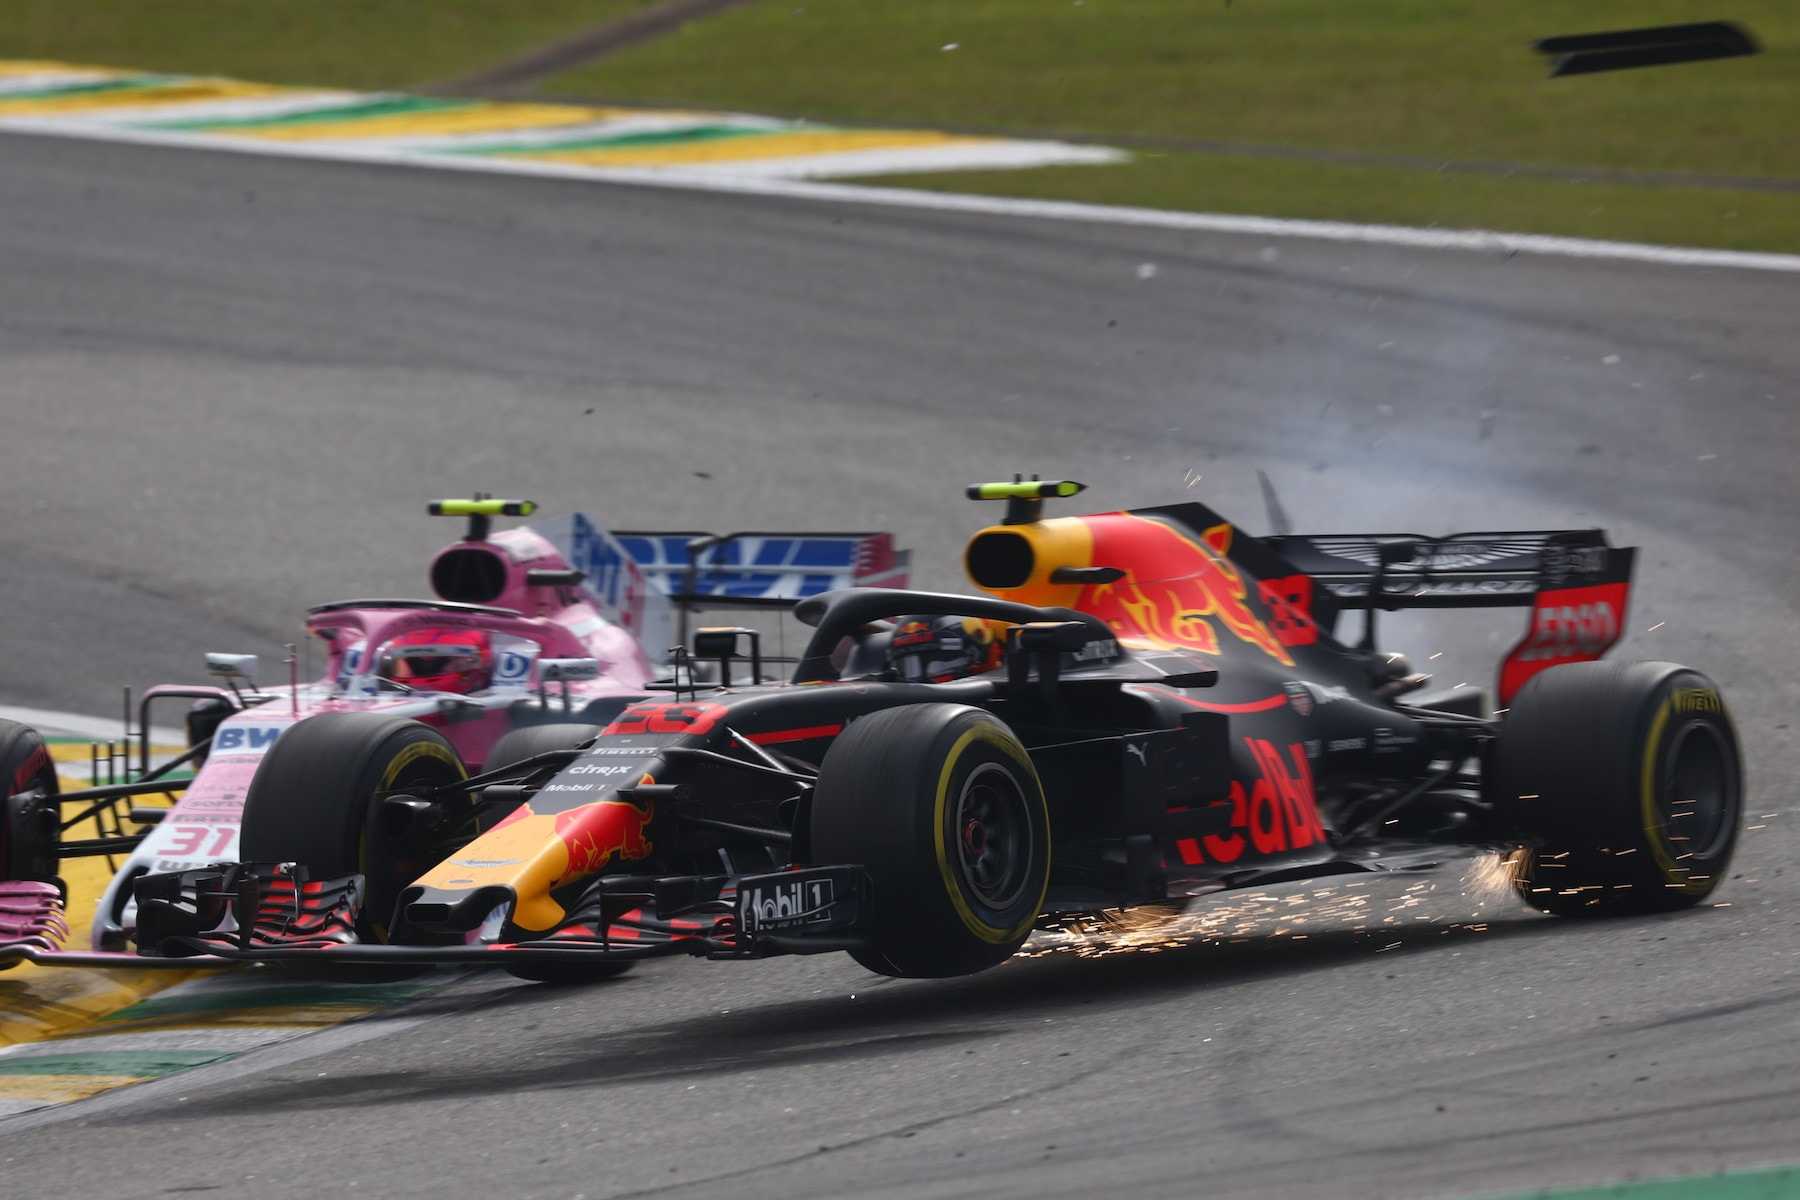 H 2018 Max Verstappen | Red Bull RB14 | 2018 Brazilian GP P2 1b copy.jpg